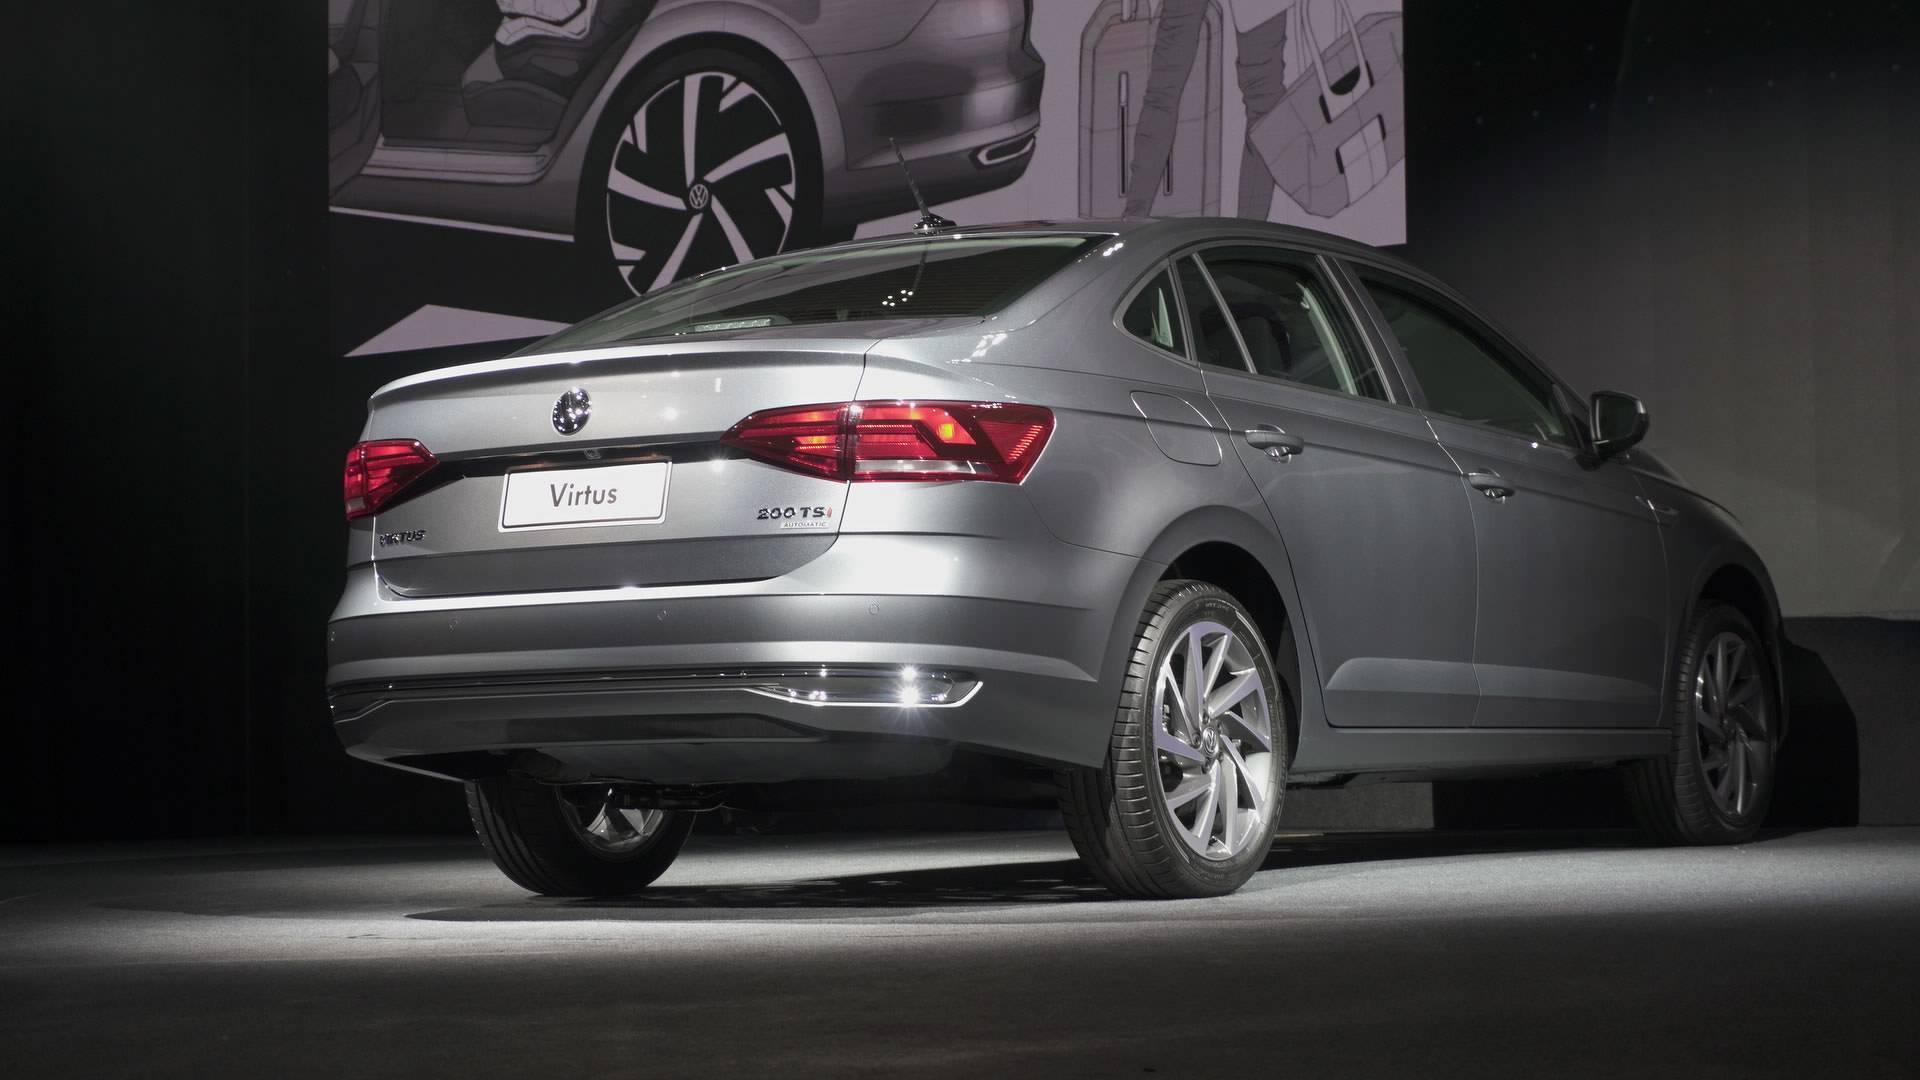 vwvortexcom  volkswagen polo based virtus sedan officially revealed